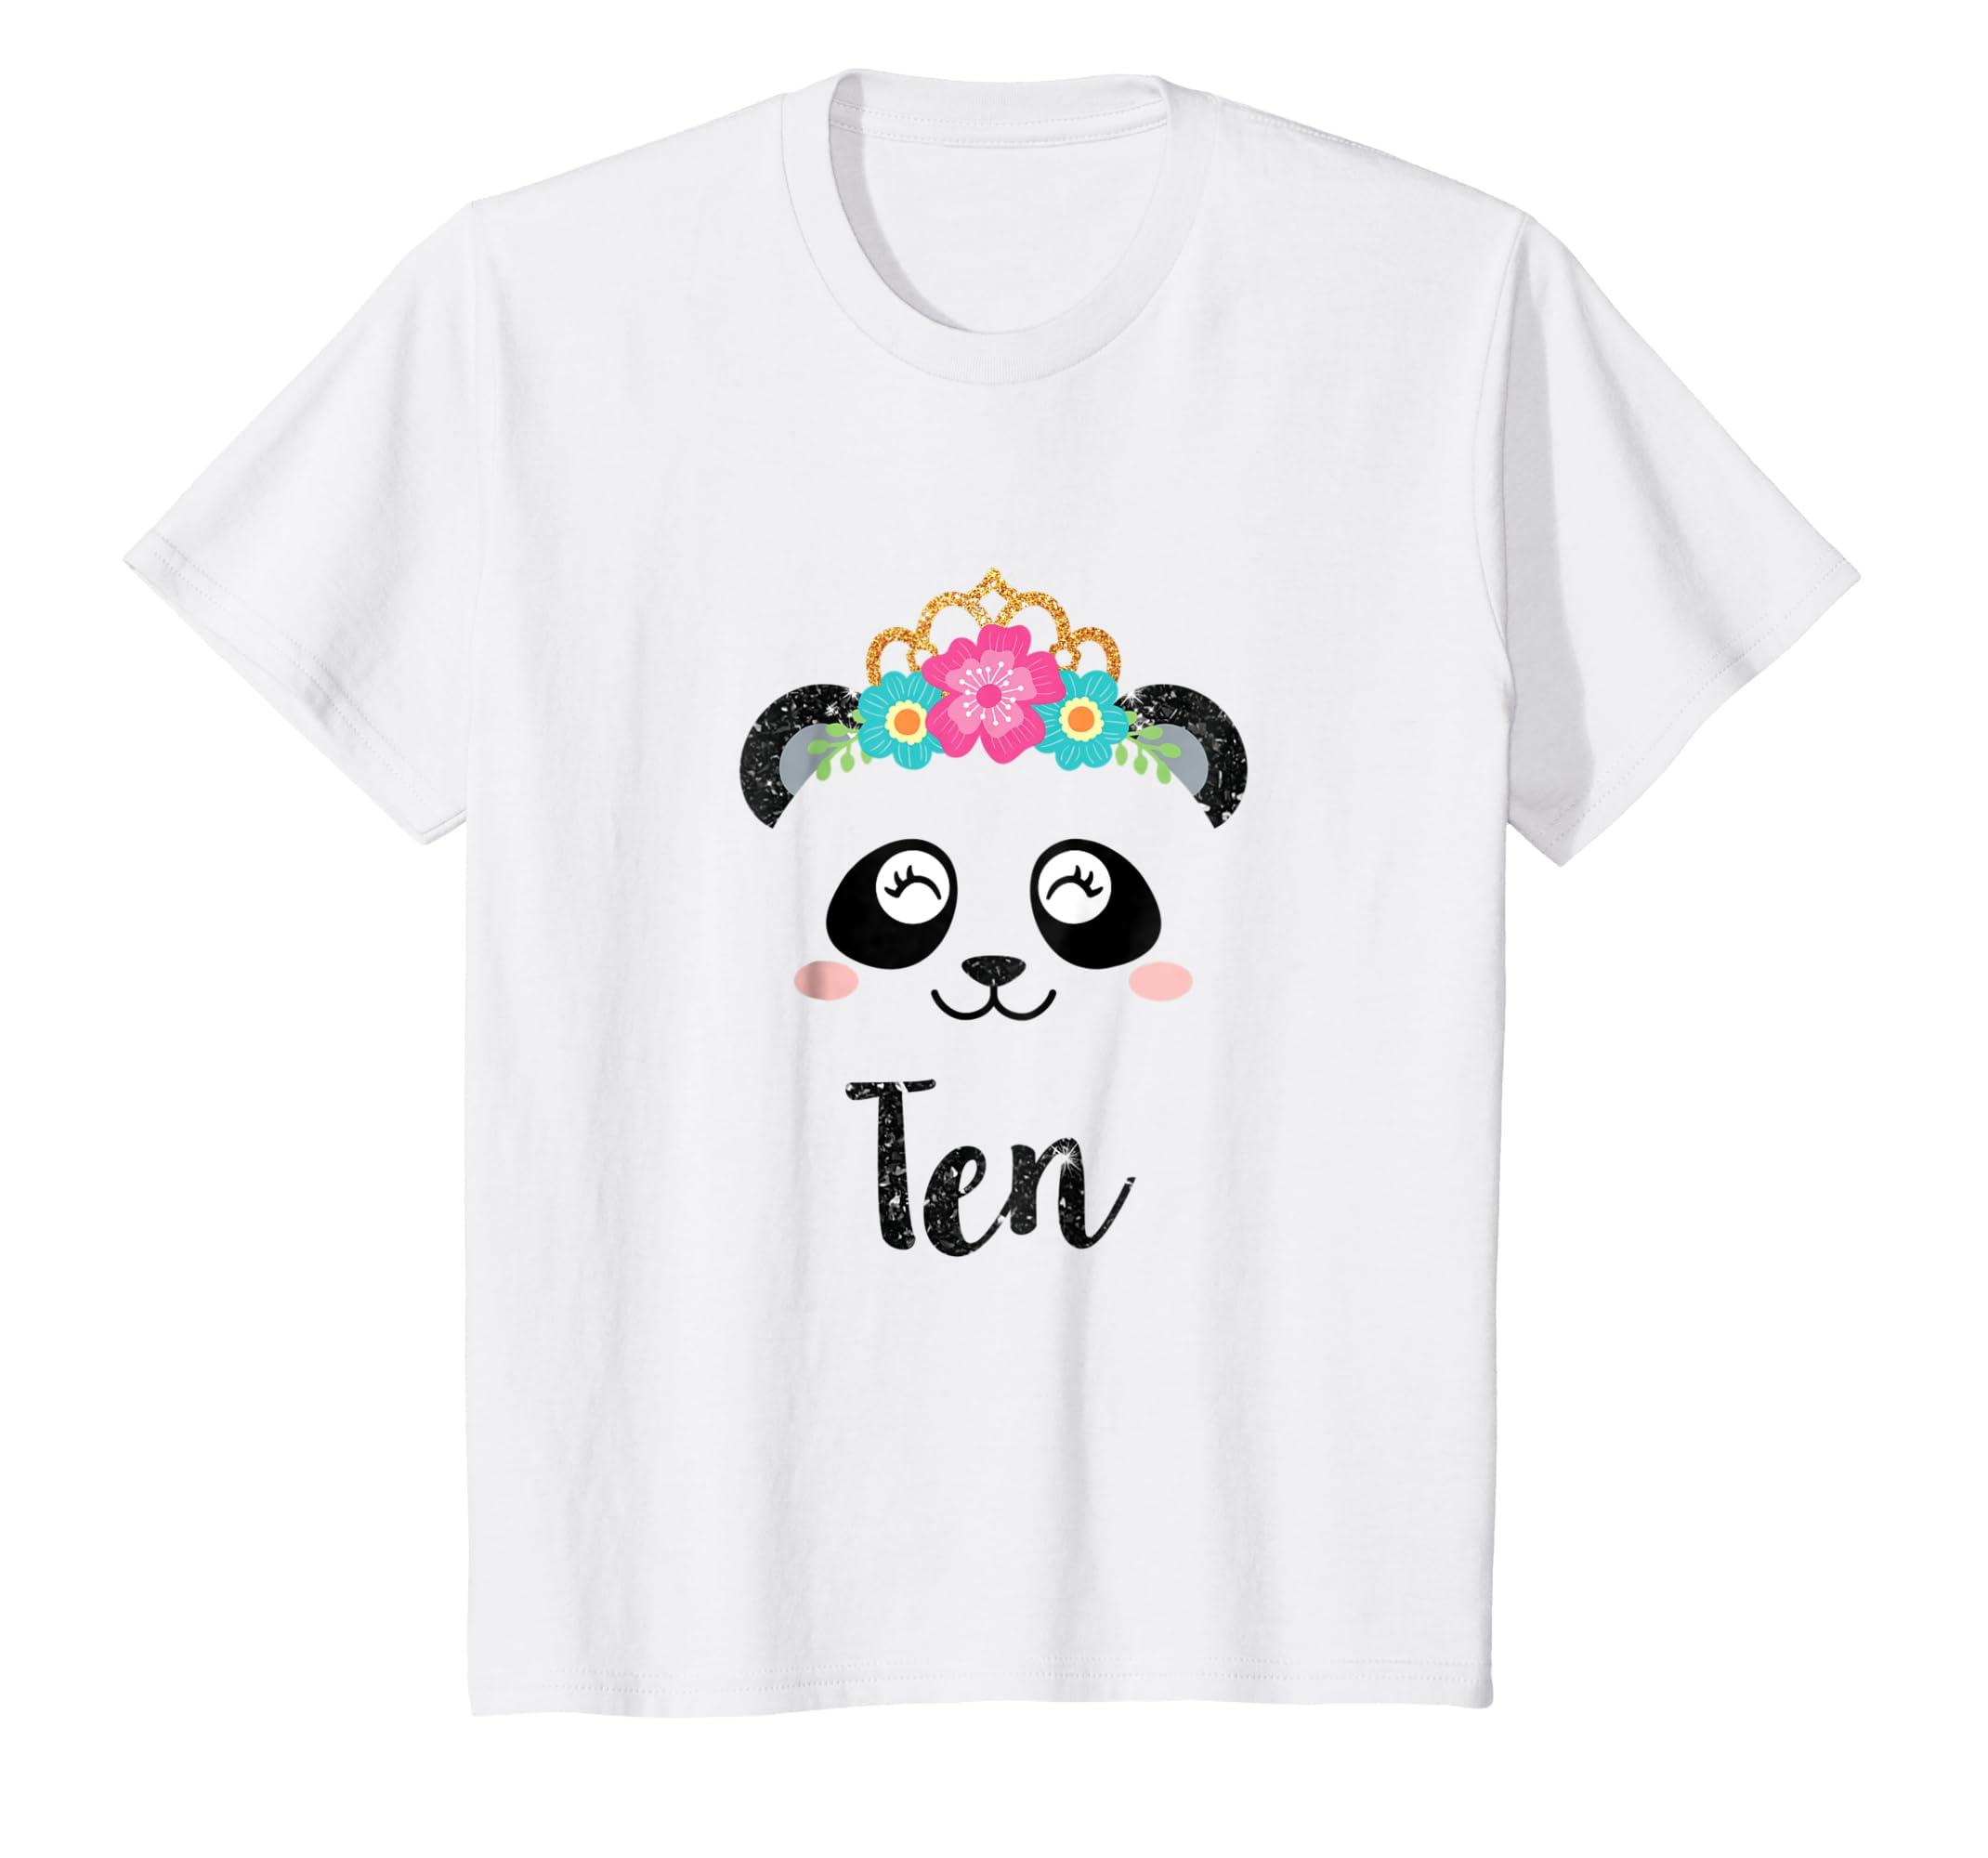 3a76e0fb8 Amazon.com  Panda Girl 10th Birthday Outfit